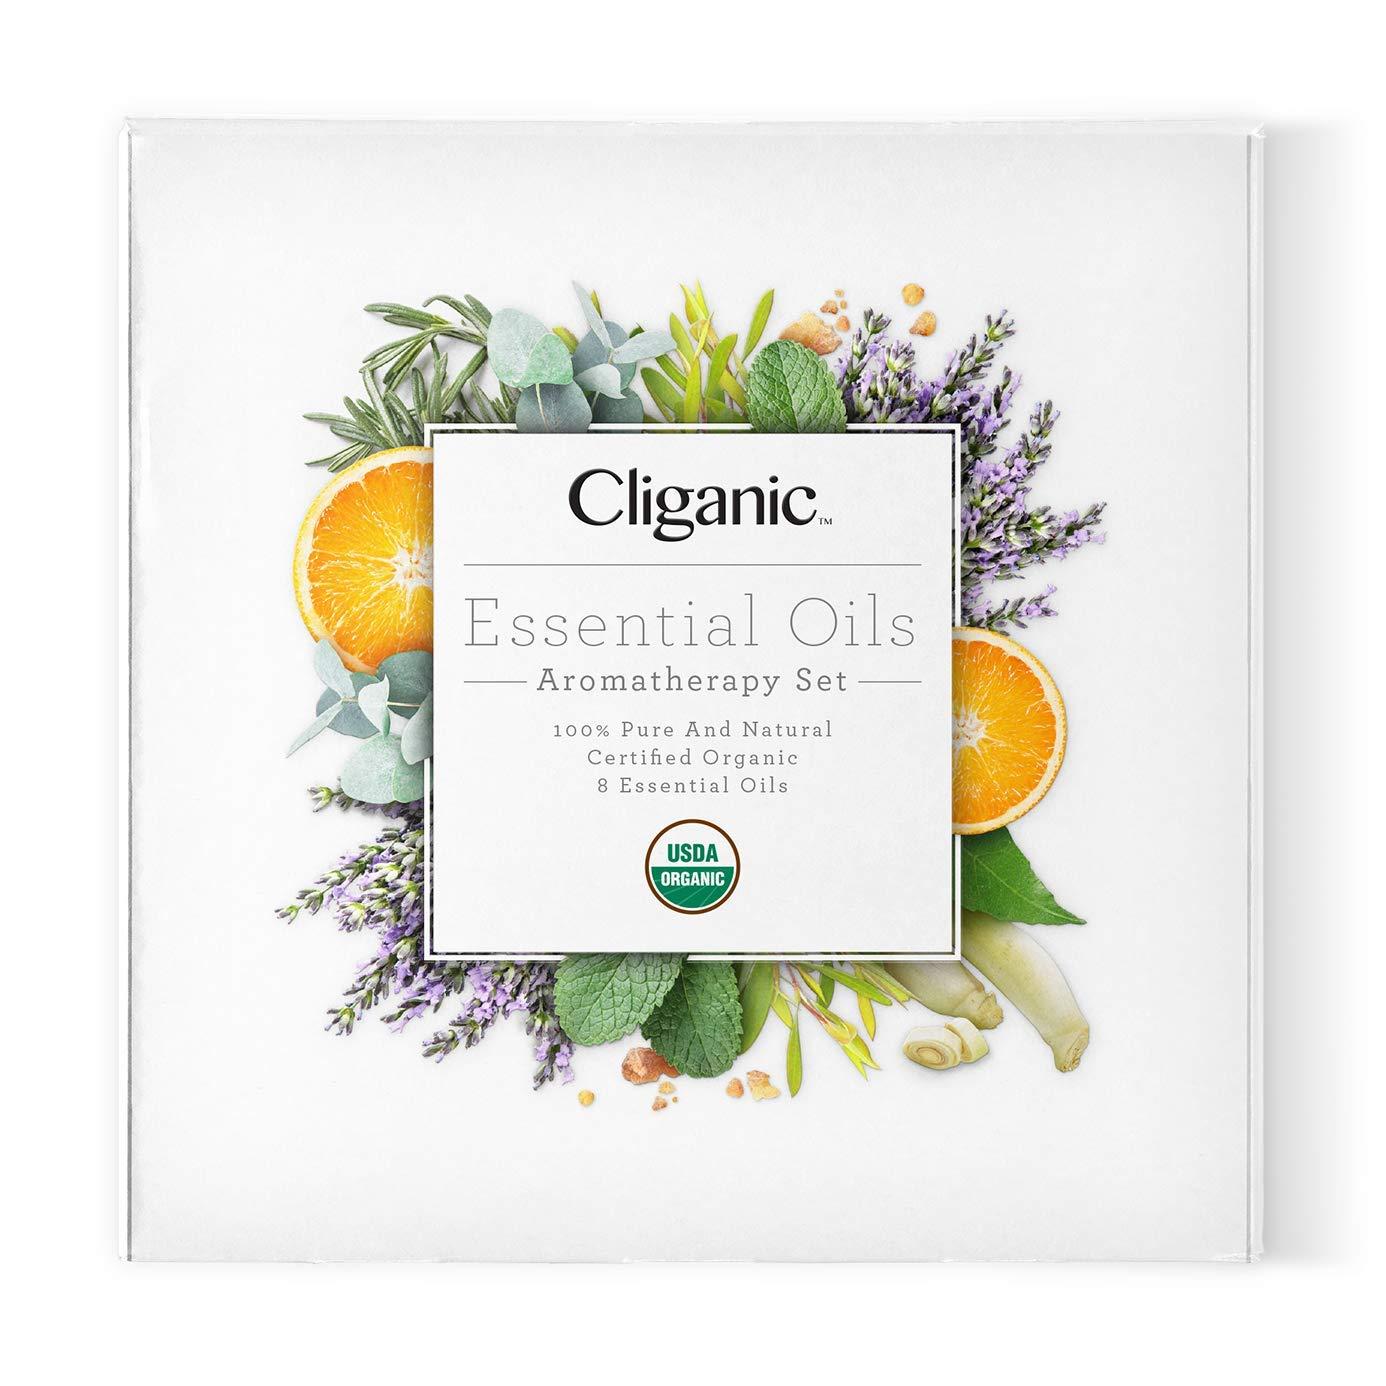 Cliganic USDA Organic Aromatherapy Essential Oils Set (8 Pack), 100% Pure Natural - Peppermint, Lavender, Eucalyptus, Tea Tree, Lemongrass, Rosemary, Frankincense & Orange | Cliganic 90 Days Warranty by Cliganic (Image #3)